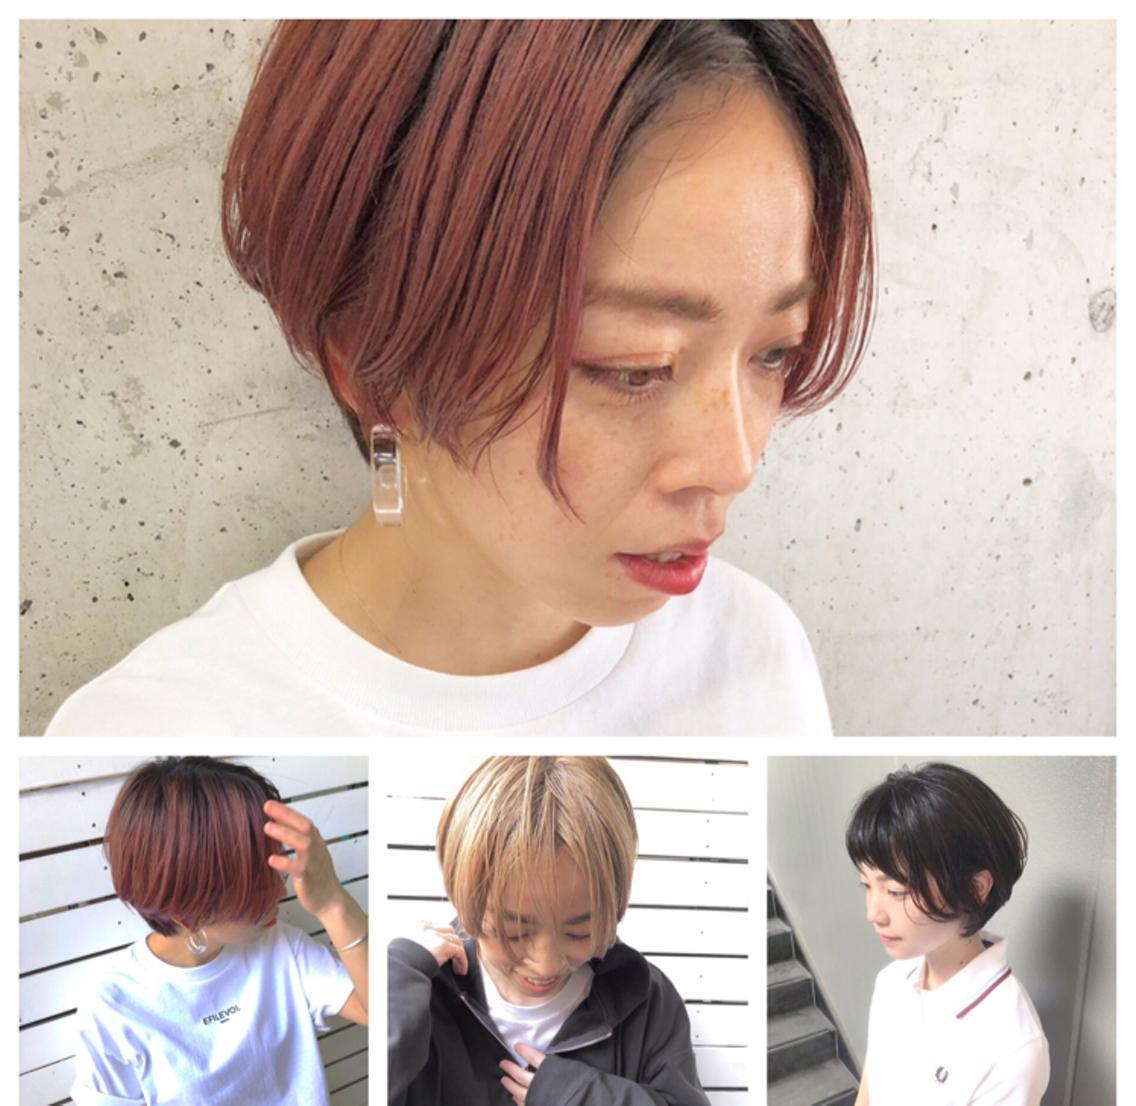 ☆MERY・HAIR記載スタイリスト☆ずっと通えるサロンをお探しの方☆お悩み改善サロン☆